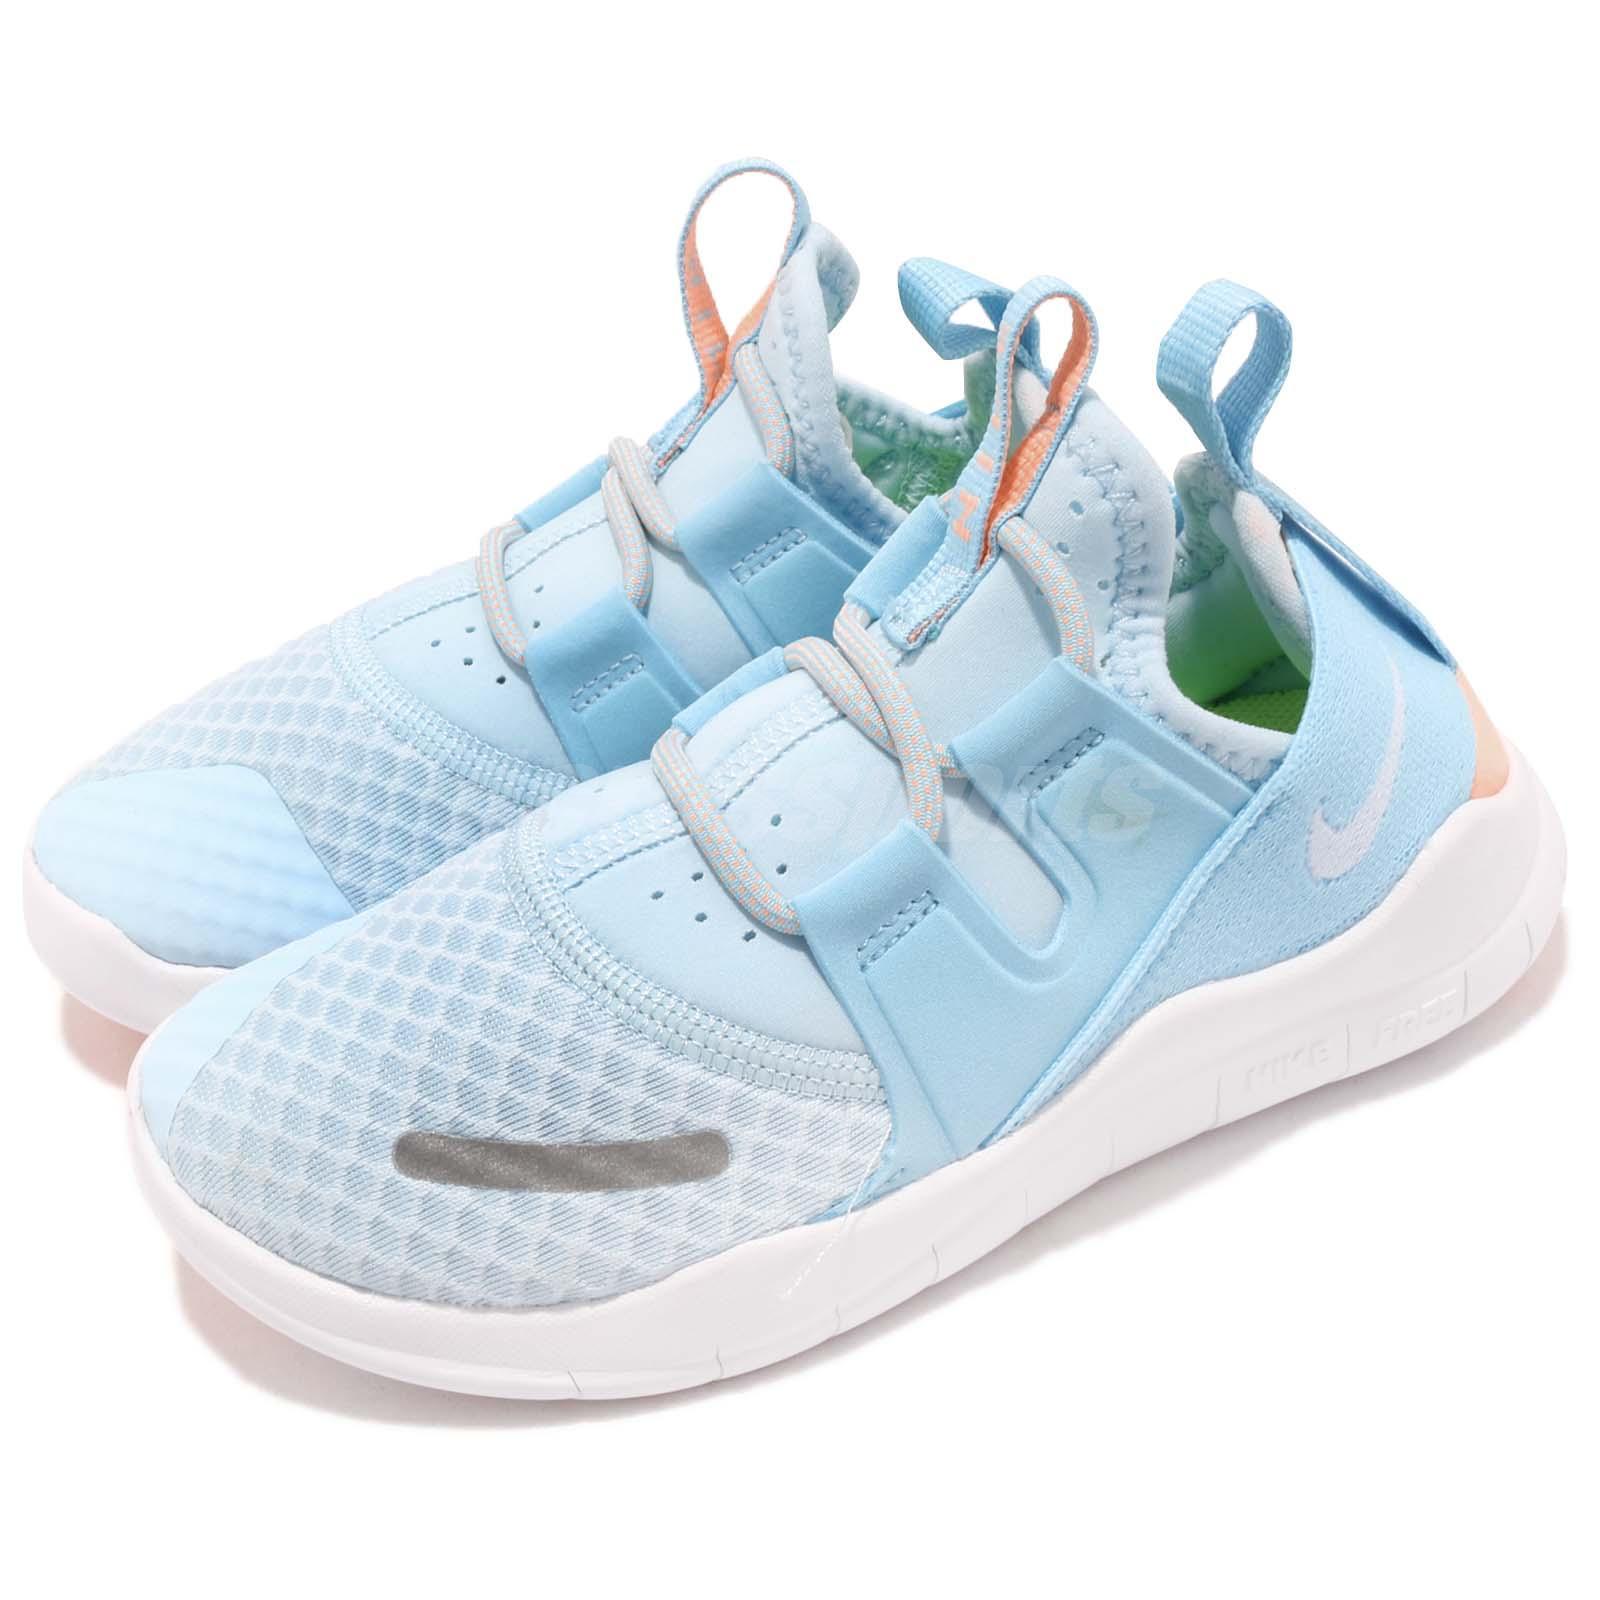 Nike Free RN CMTR 2018 PS White Blue